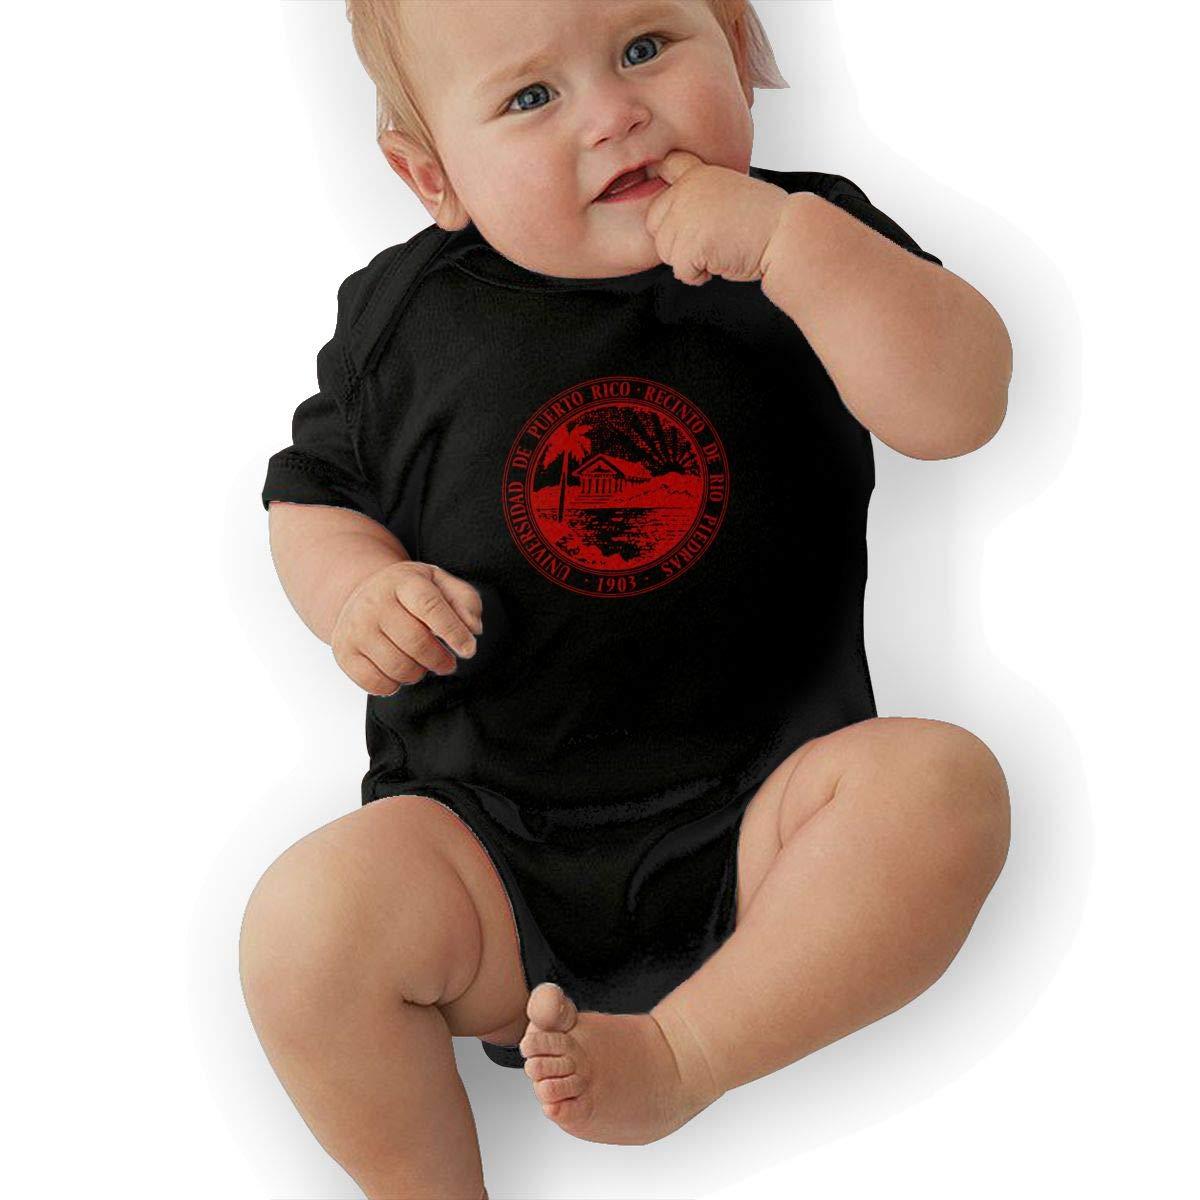 Puerto Rico Recinto Newborn Baby Short Sleeve Romper Infant Summer Clothing